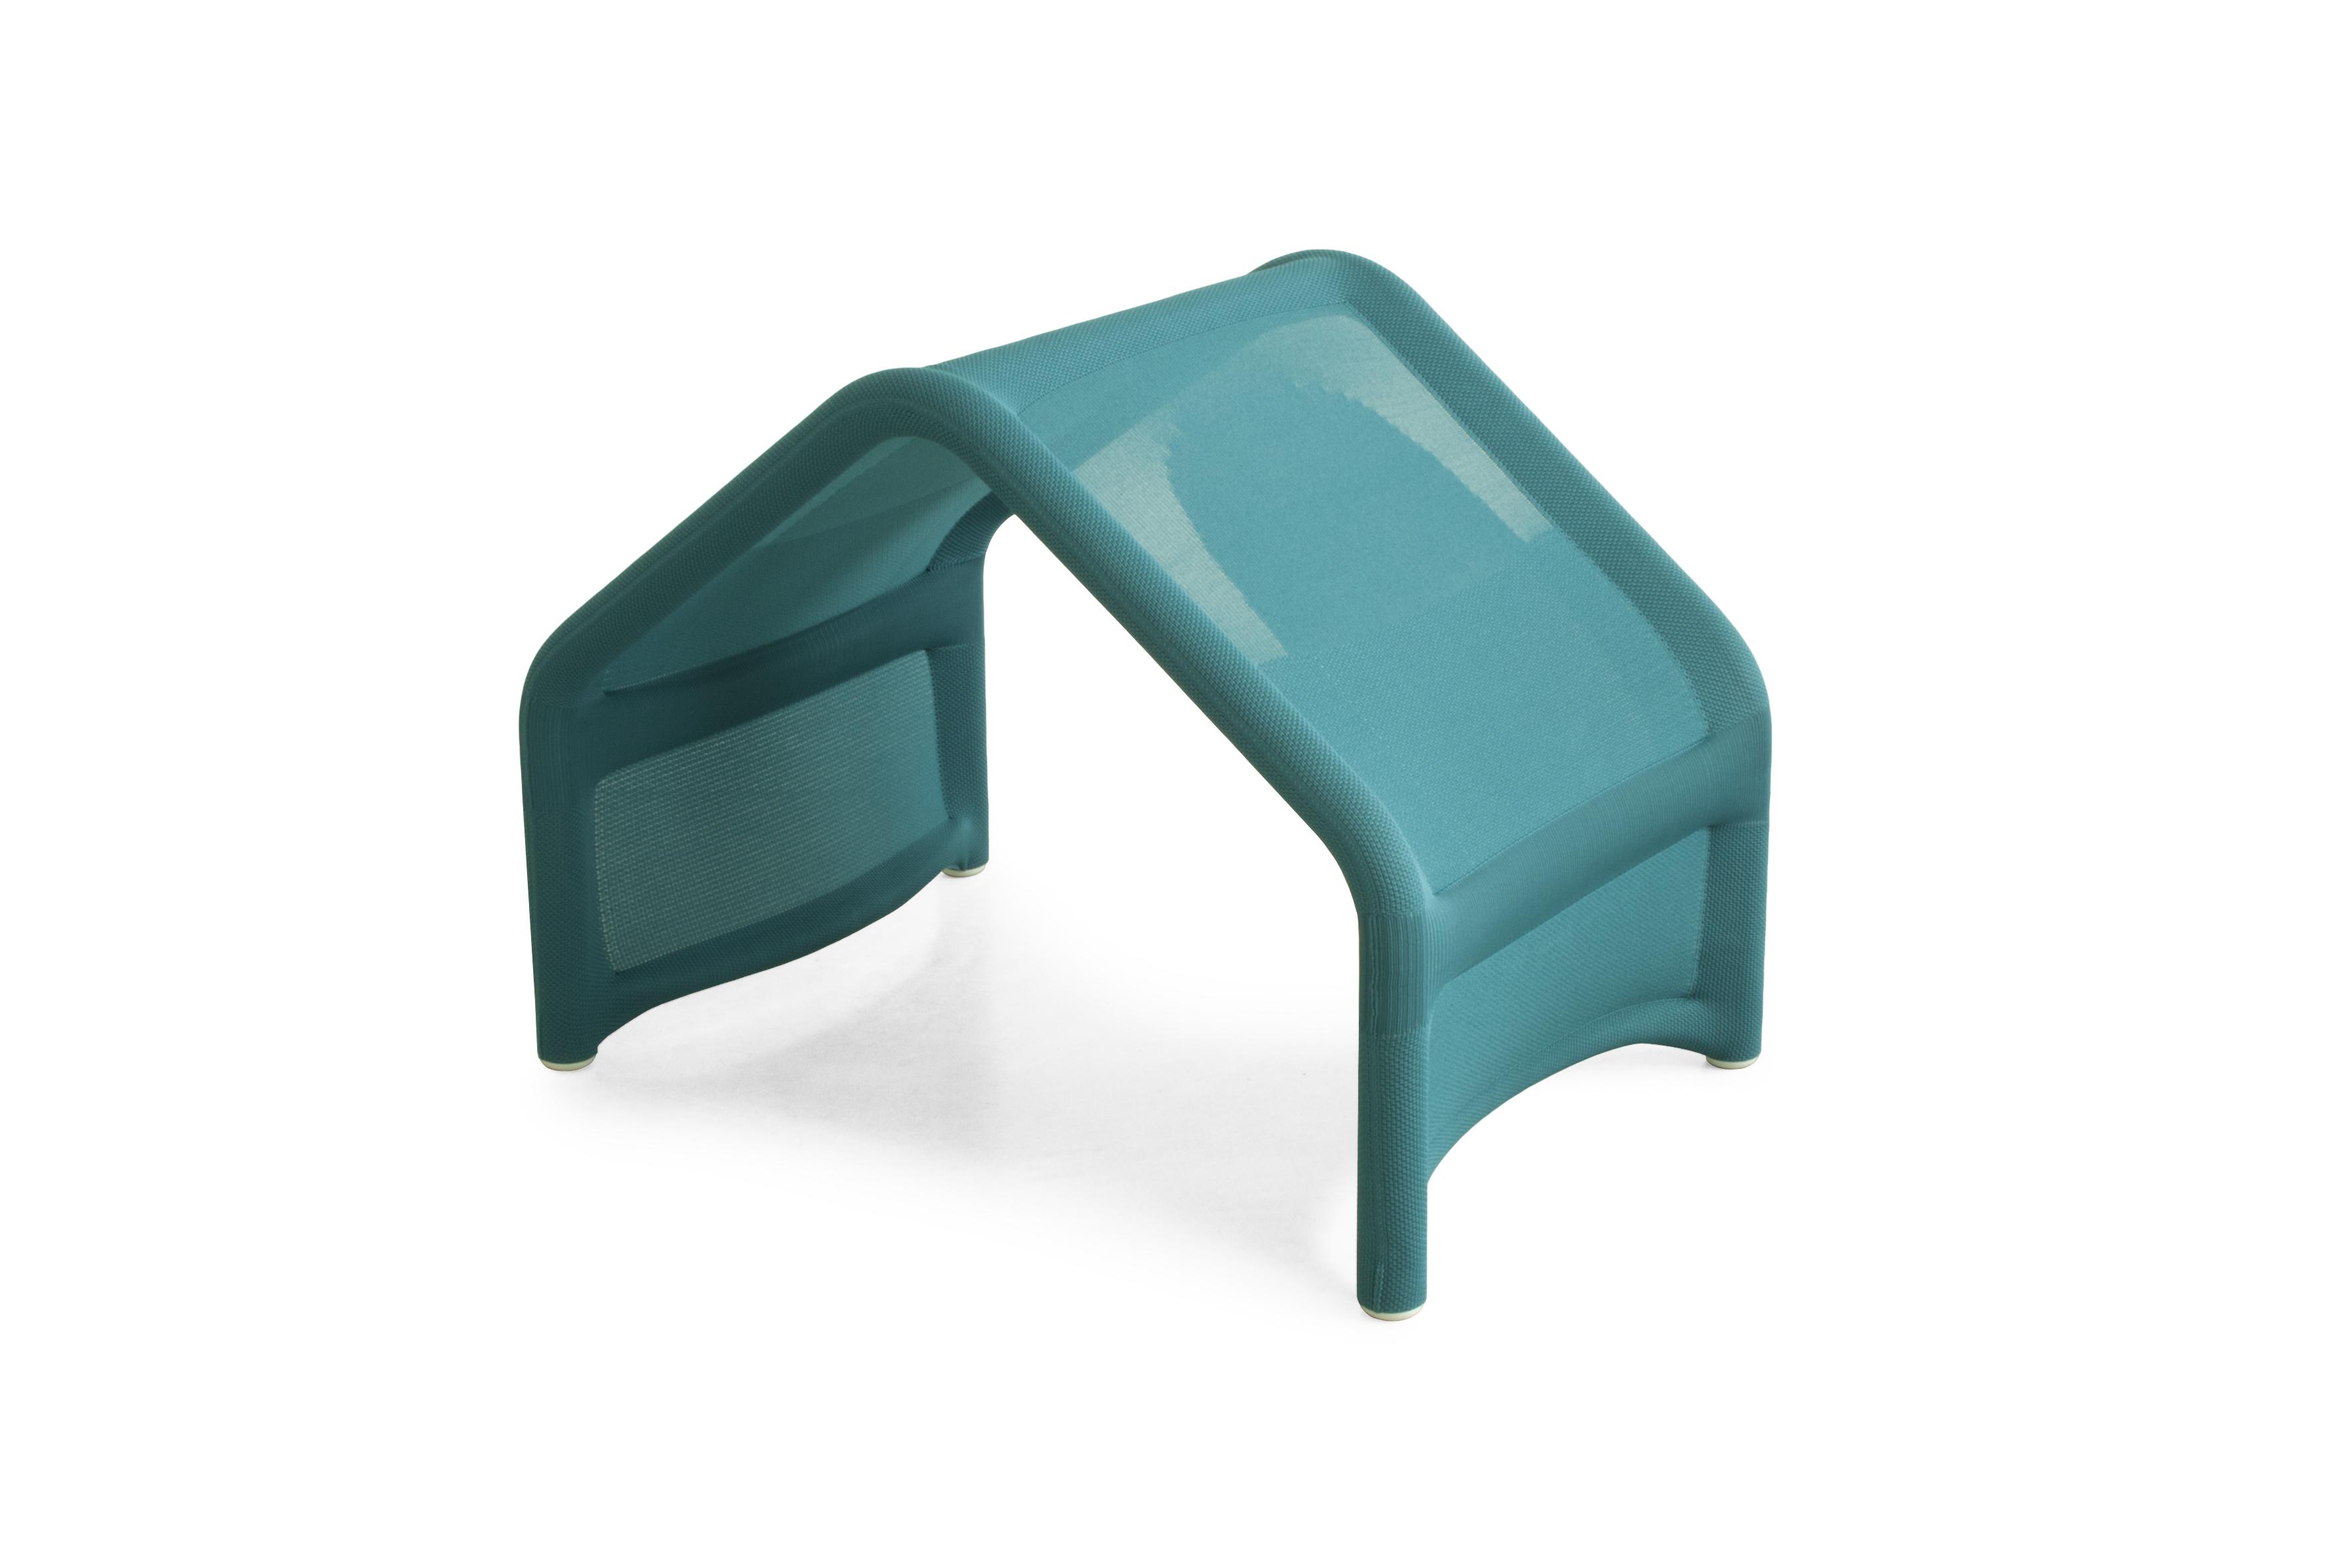 online product jaime owo black magis store chair hayon detail mila design